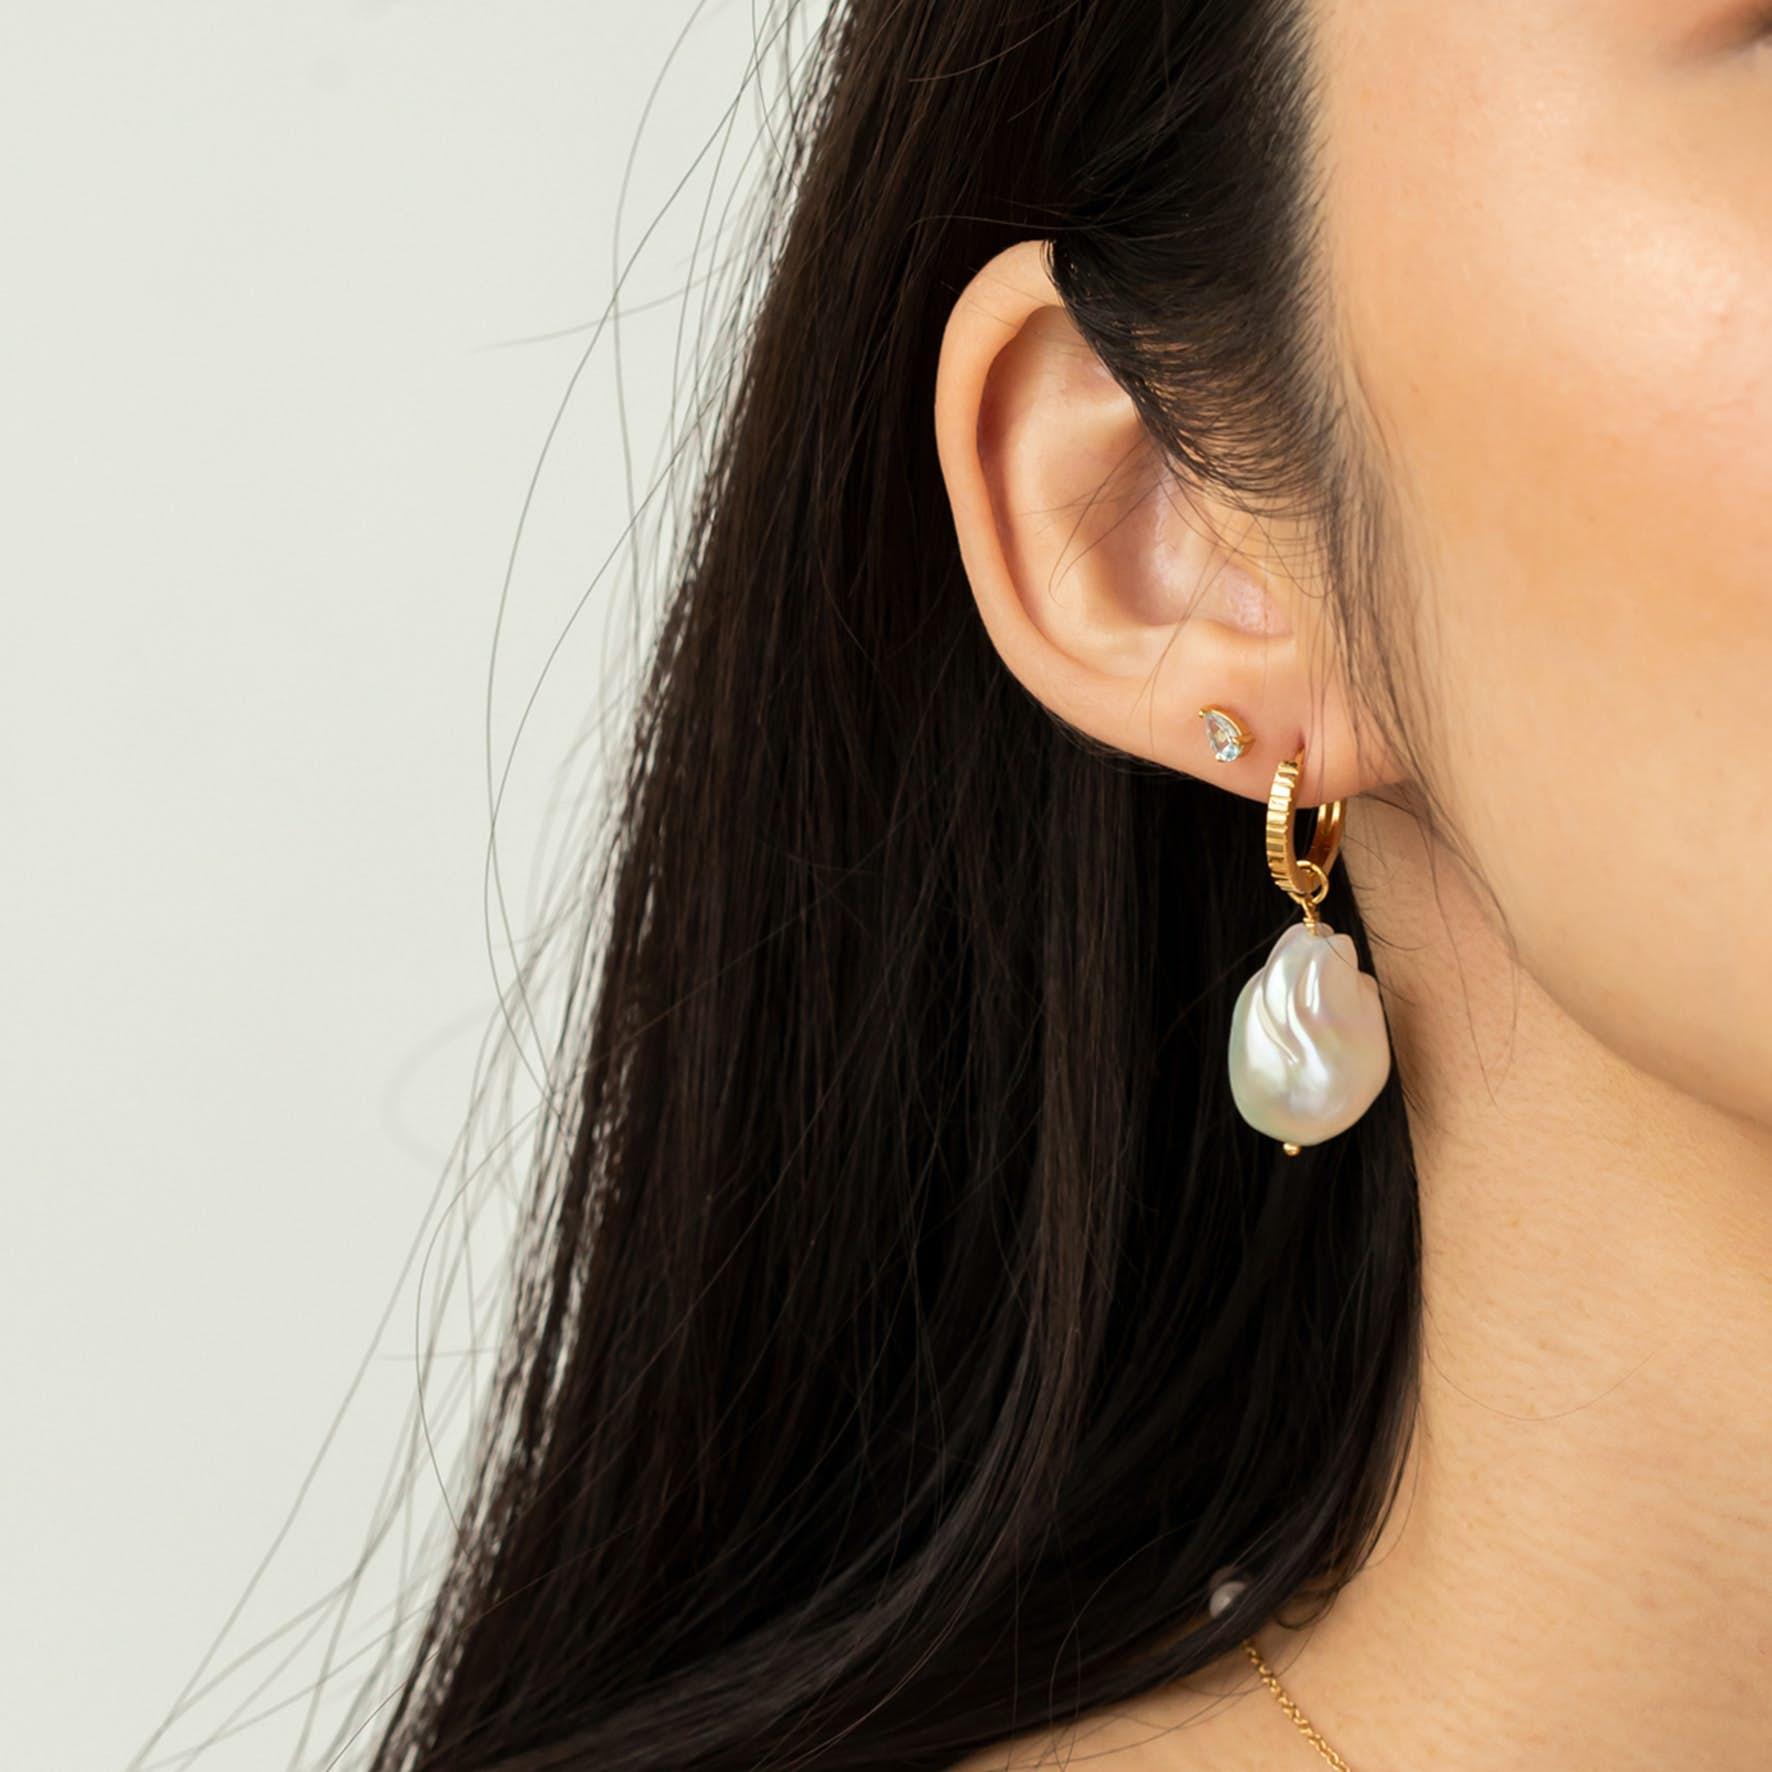 Classic Pinstripe Earrings Small från Carré i Förgyllt-Silver Sterling 925